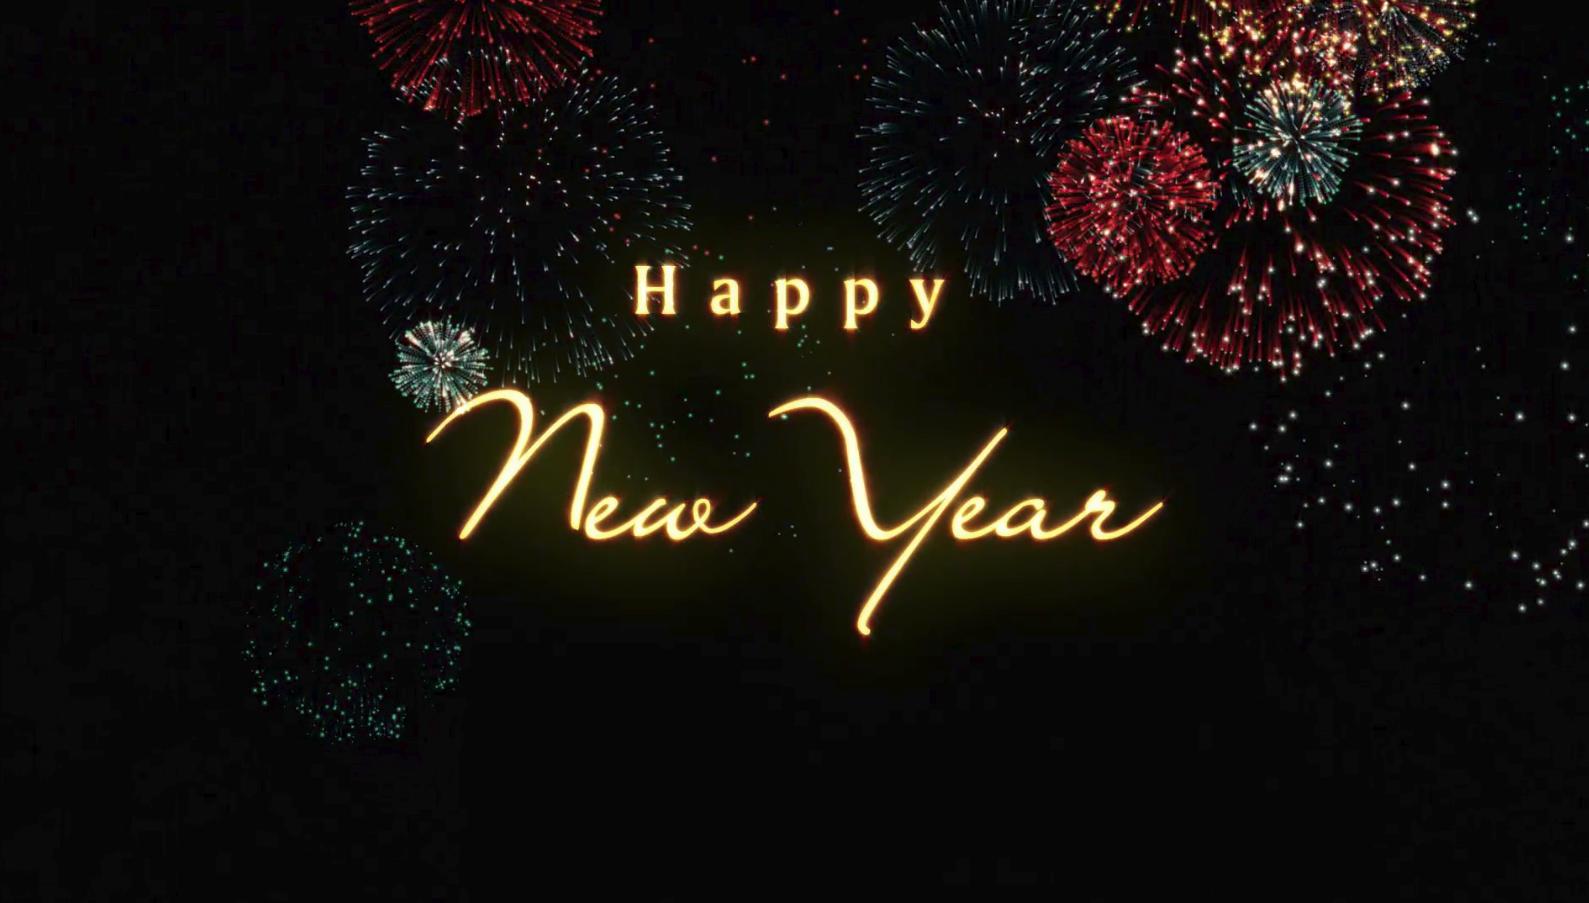 Happy New Year 2020 Happy New Year Images Happy New Year Fireworks Happy New Year 2020